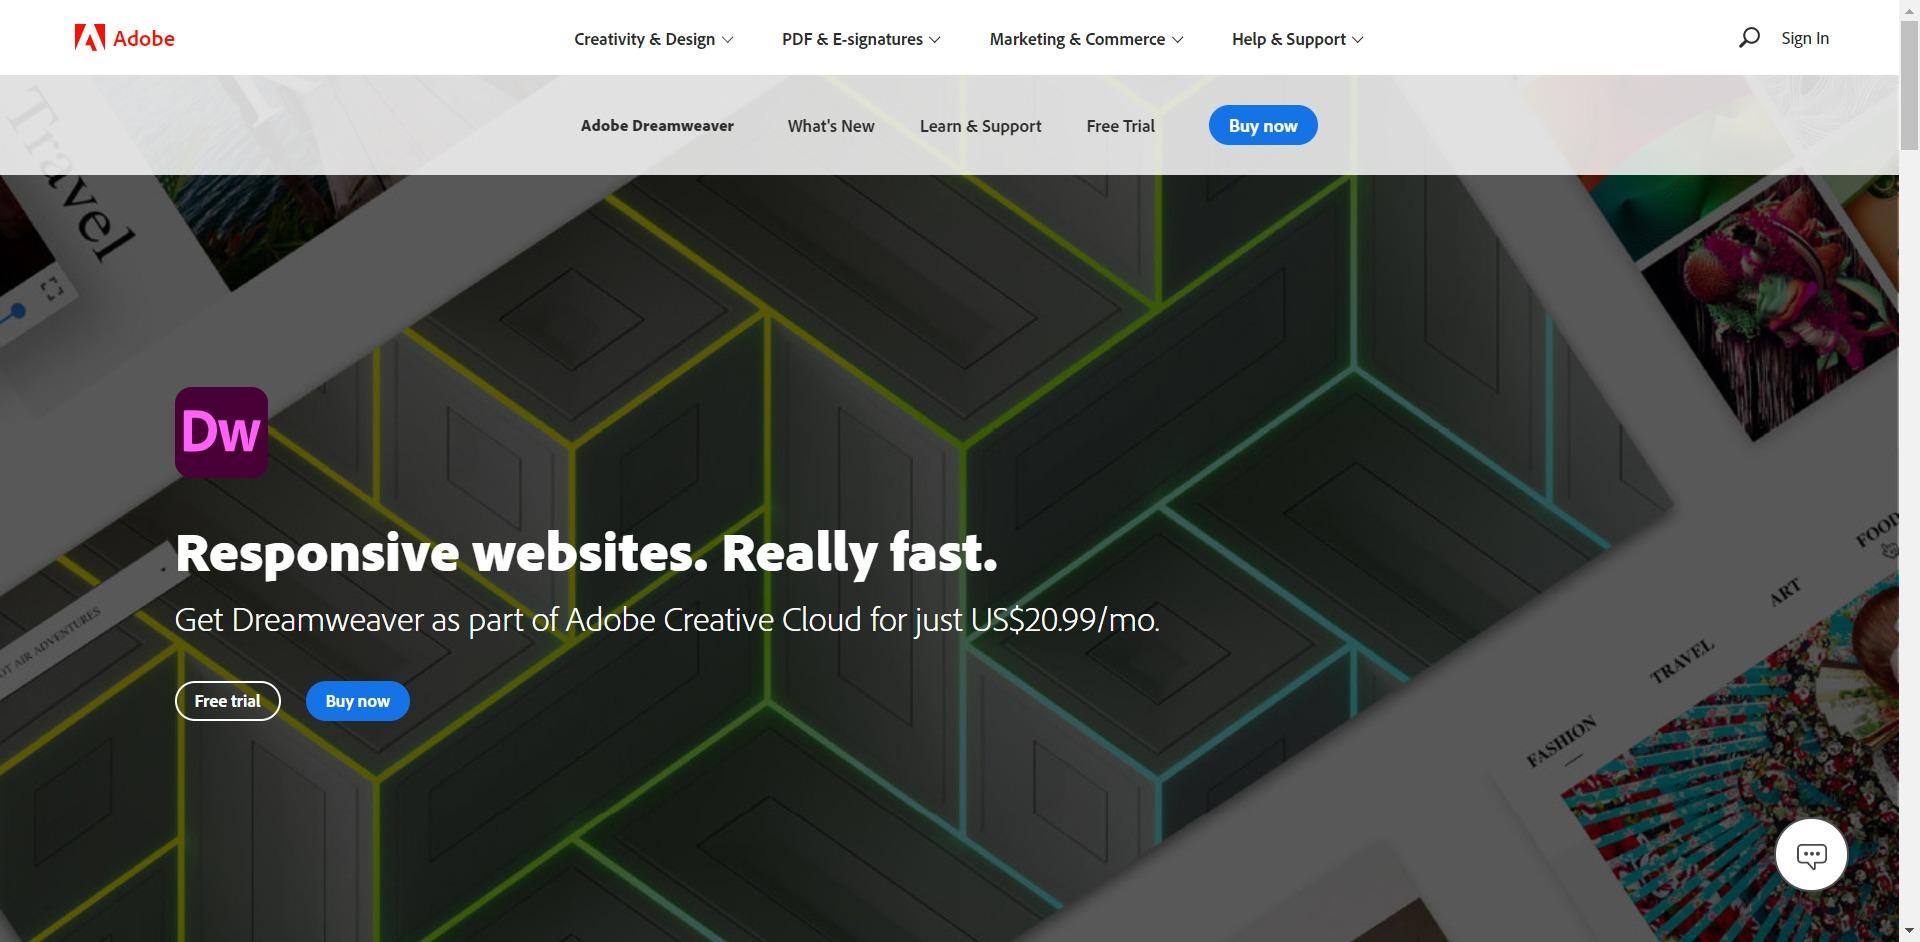 Adobe Dreamweaver home page